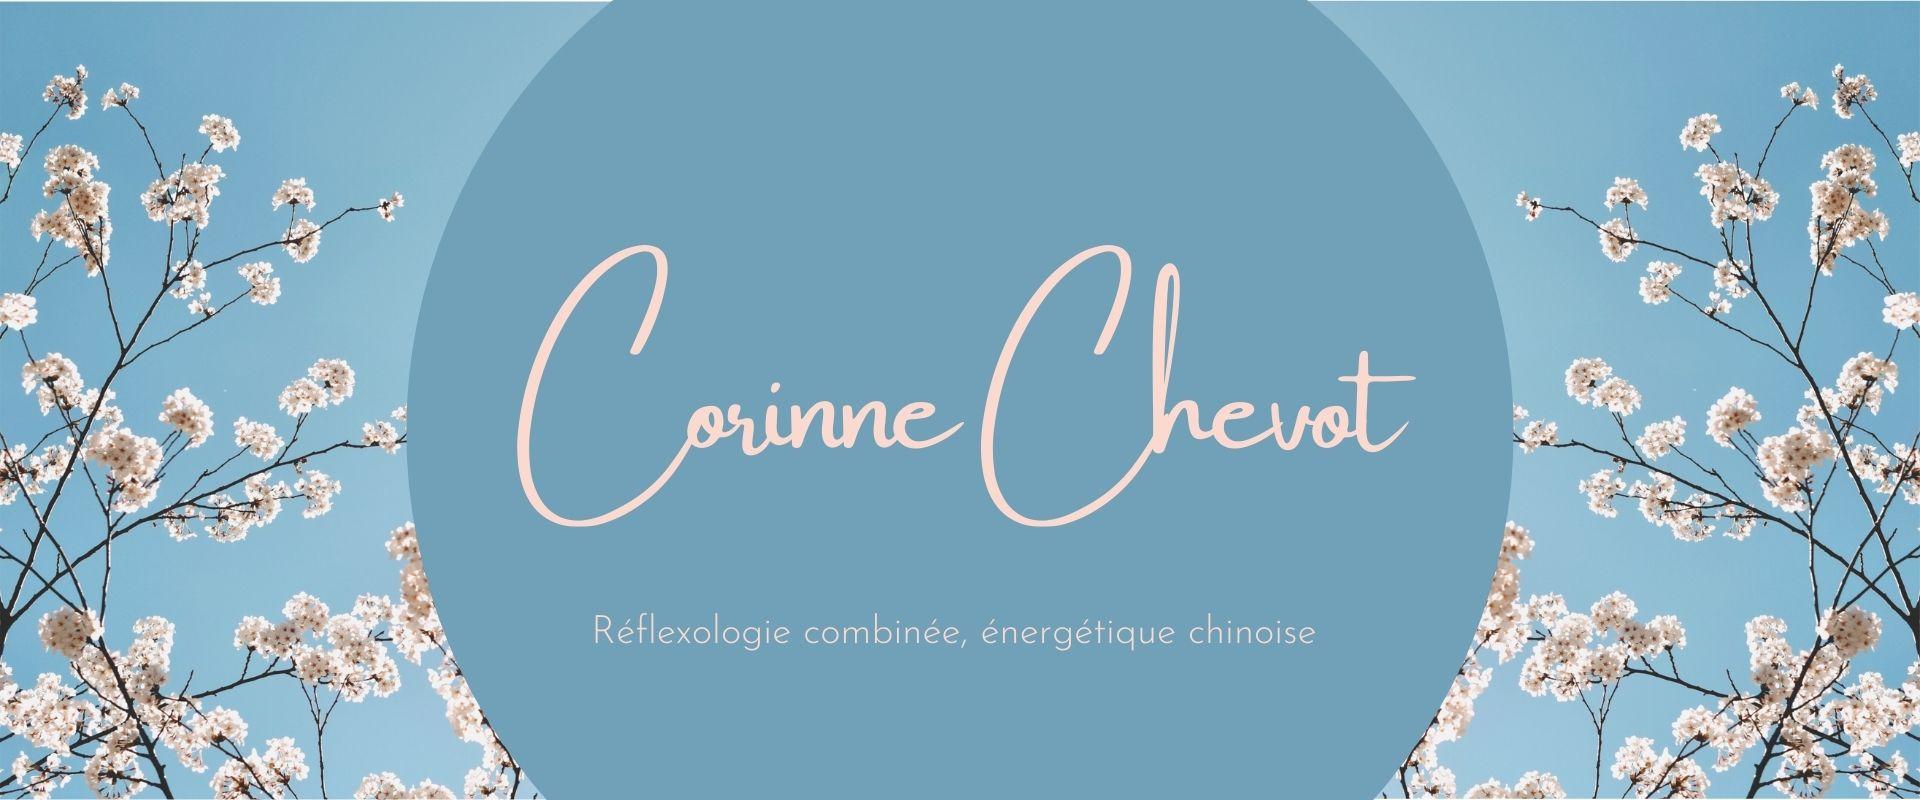 Corinne Chevot, réflexologue